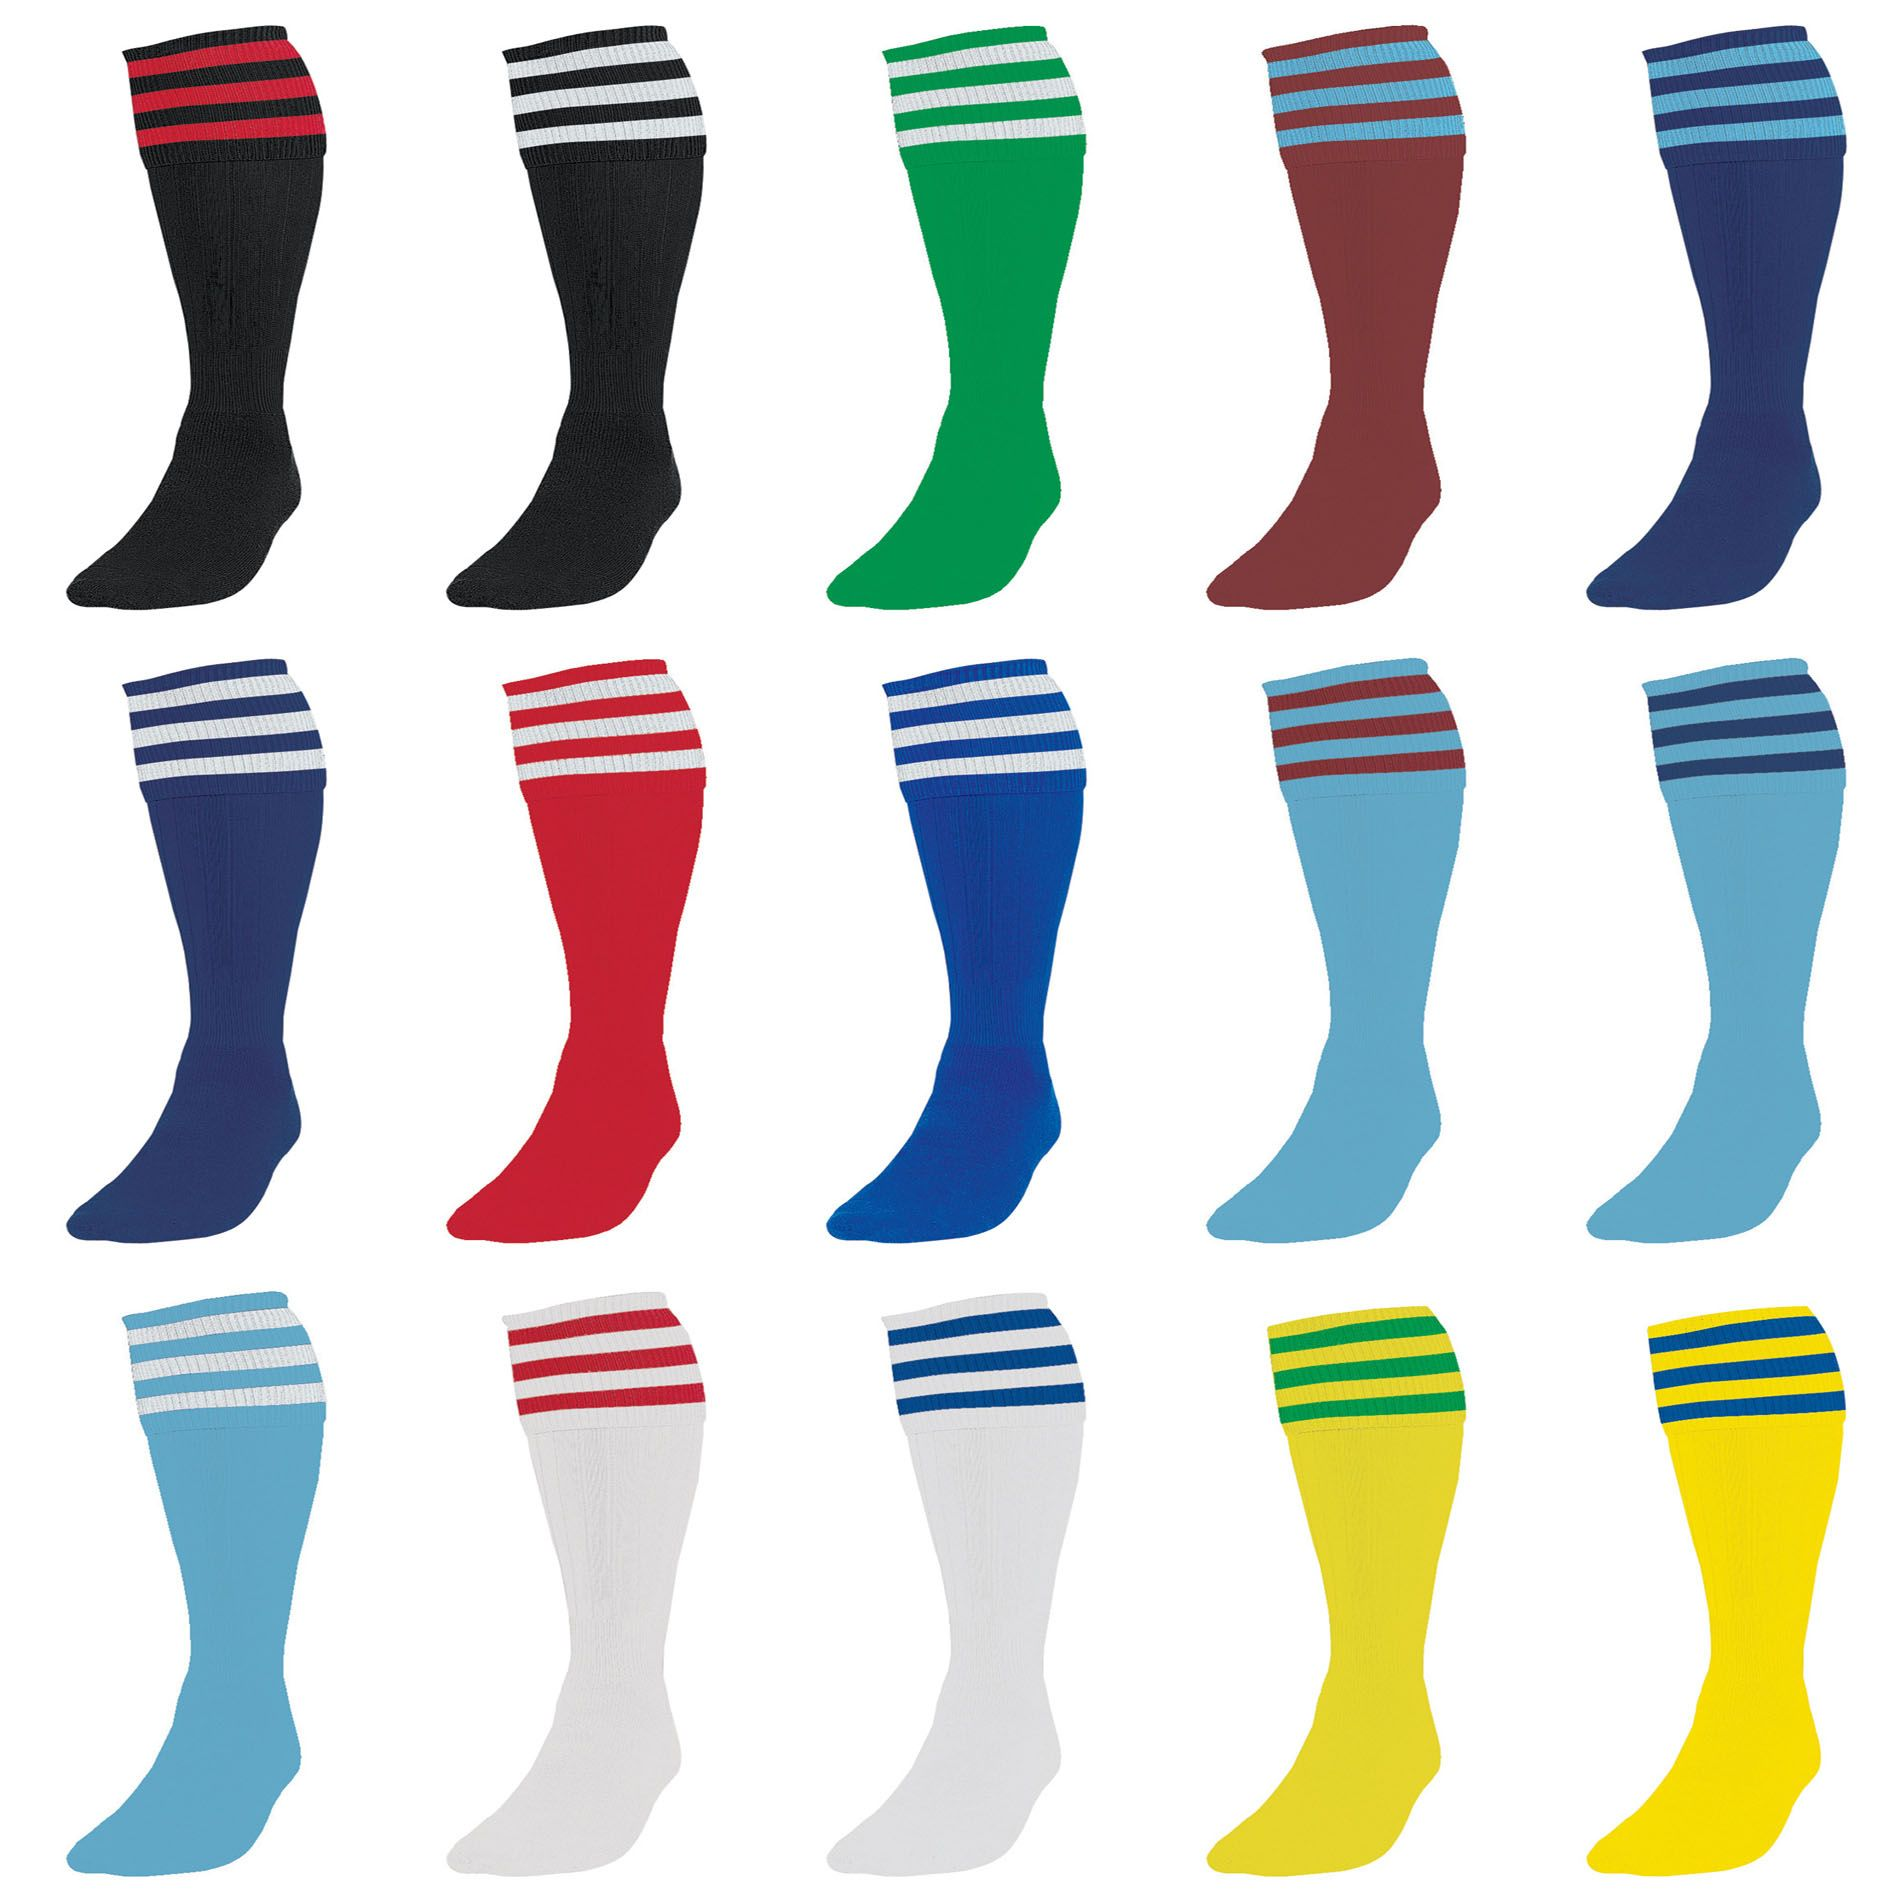 704_sock